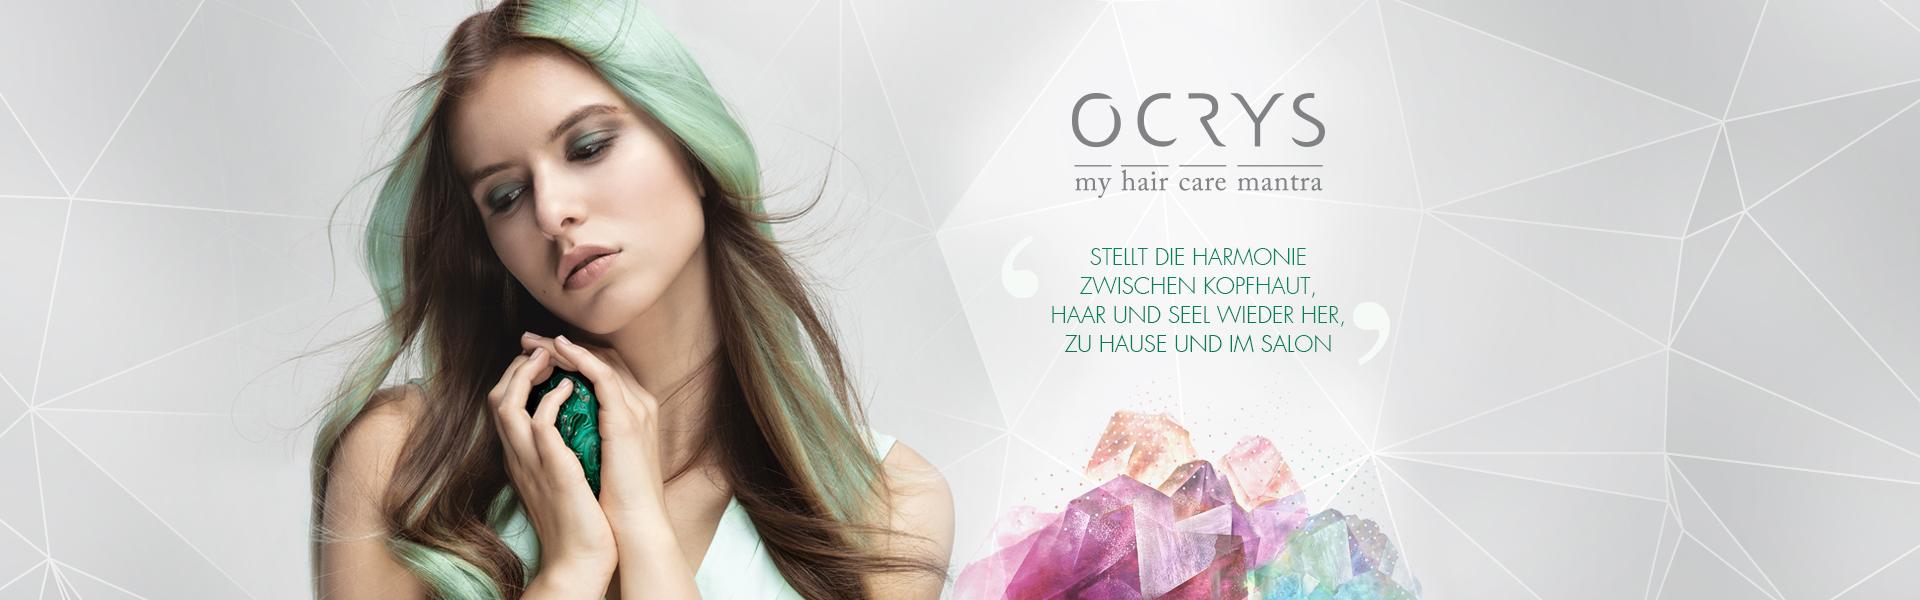 banner_centrali_OCRYS_DE